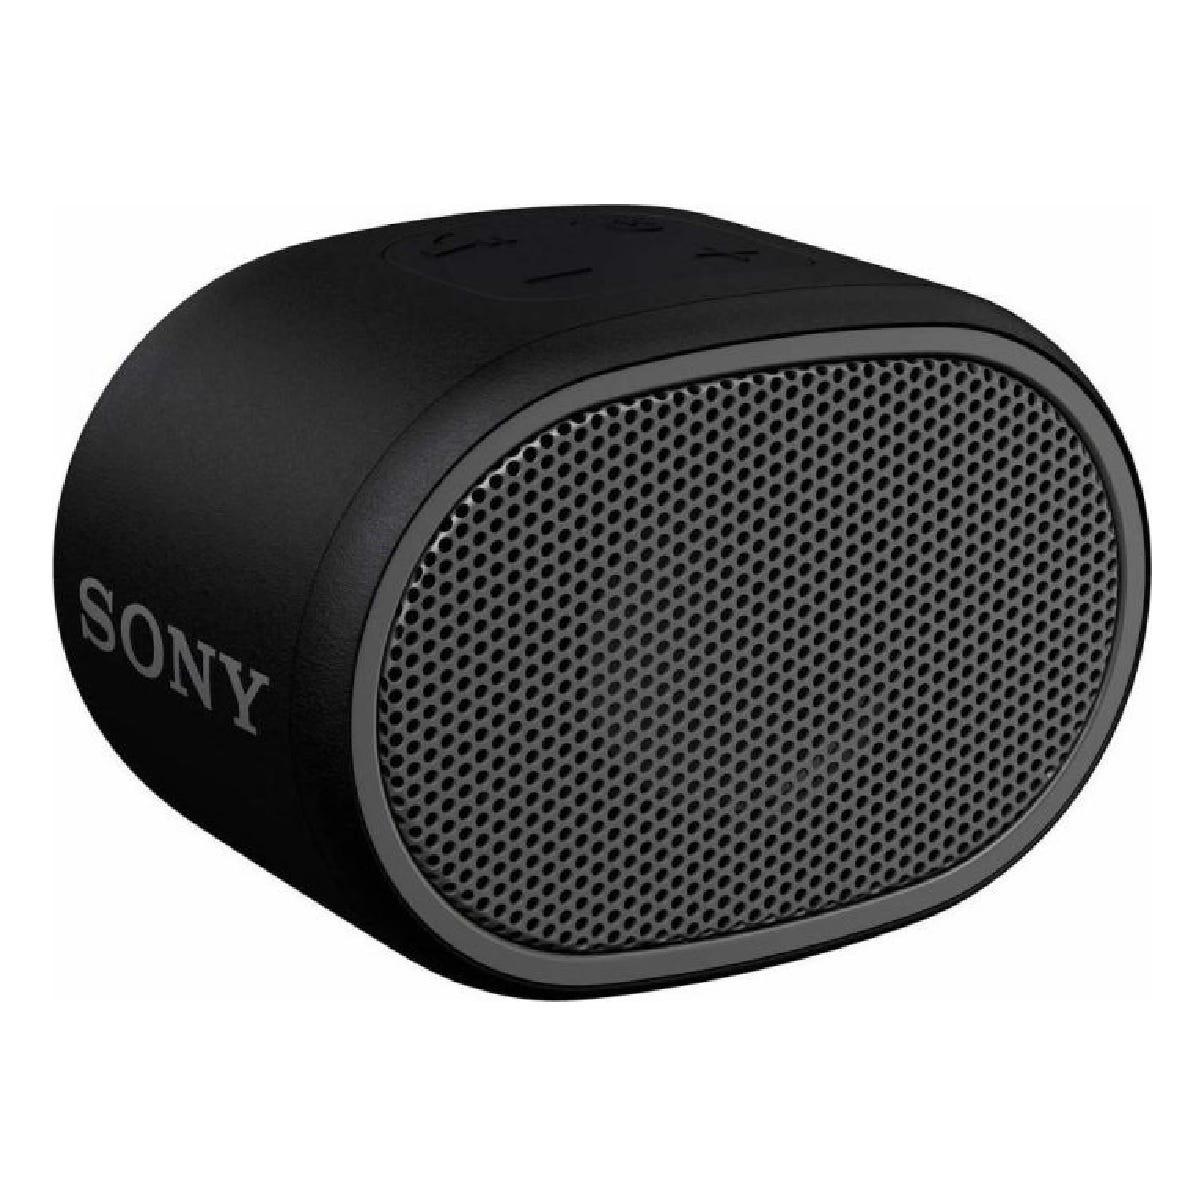 Sony Light Portable Bluetooth Speaker - Black